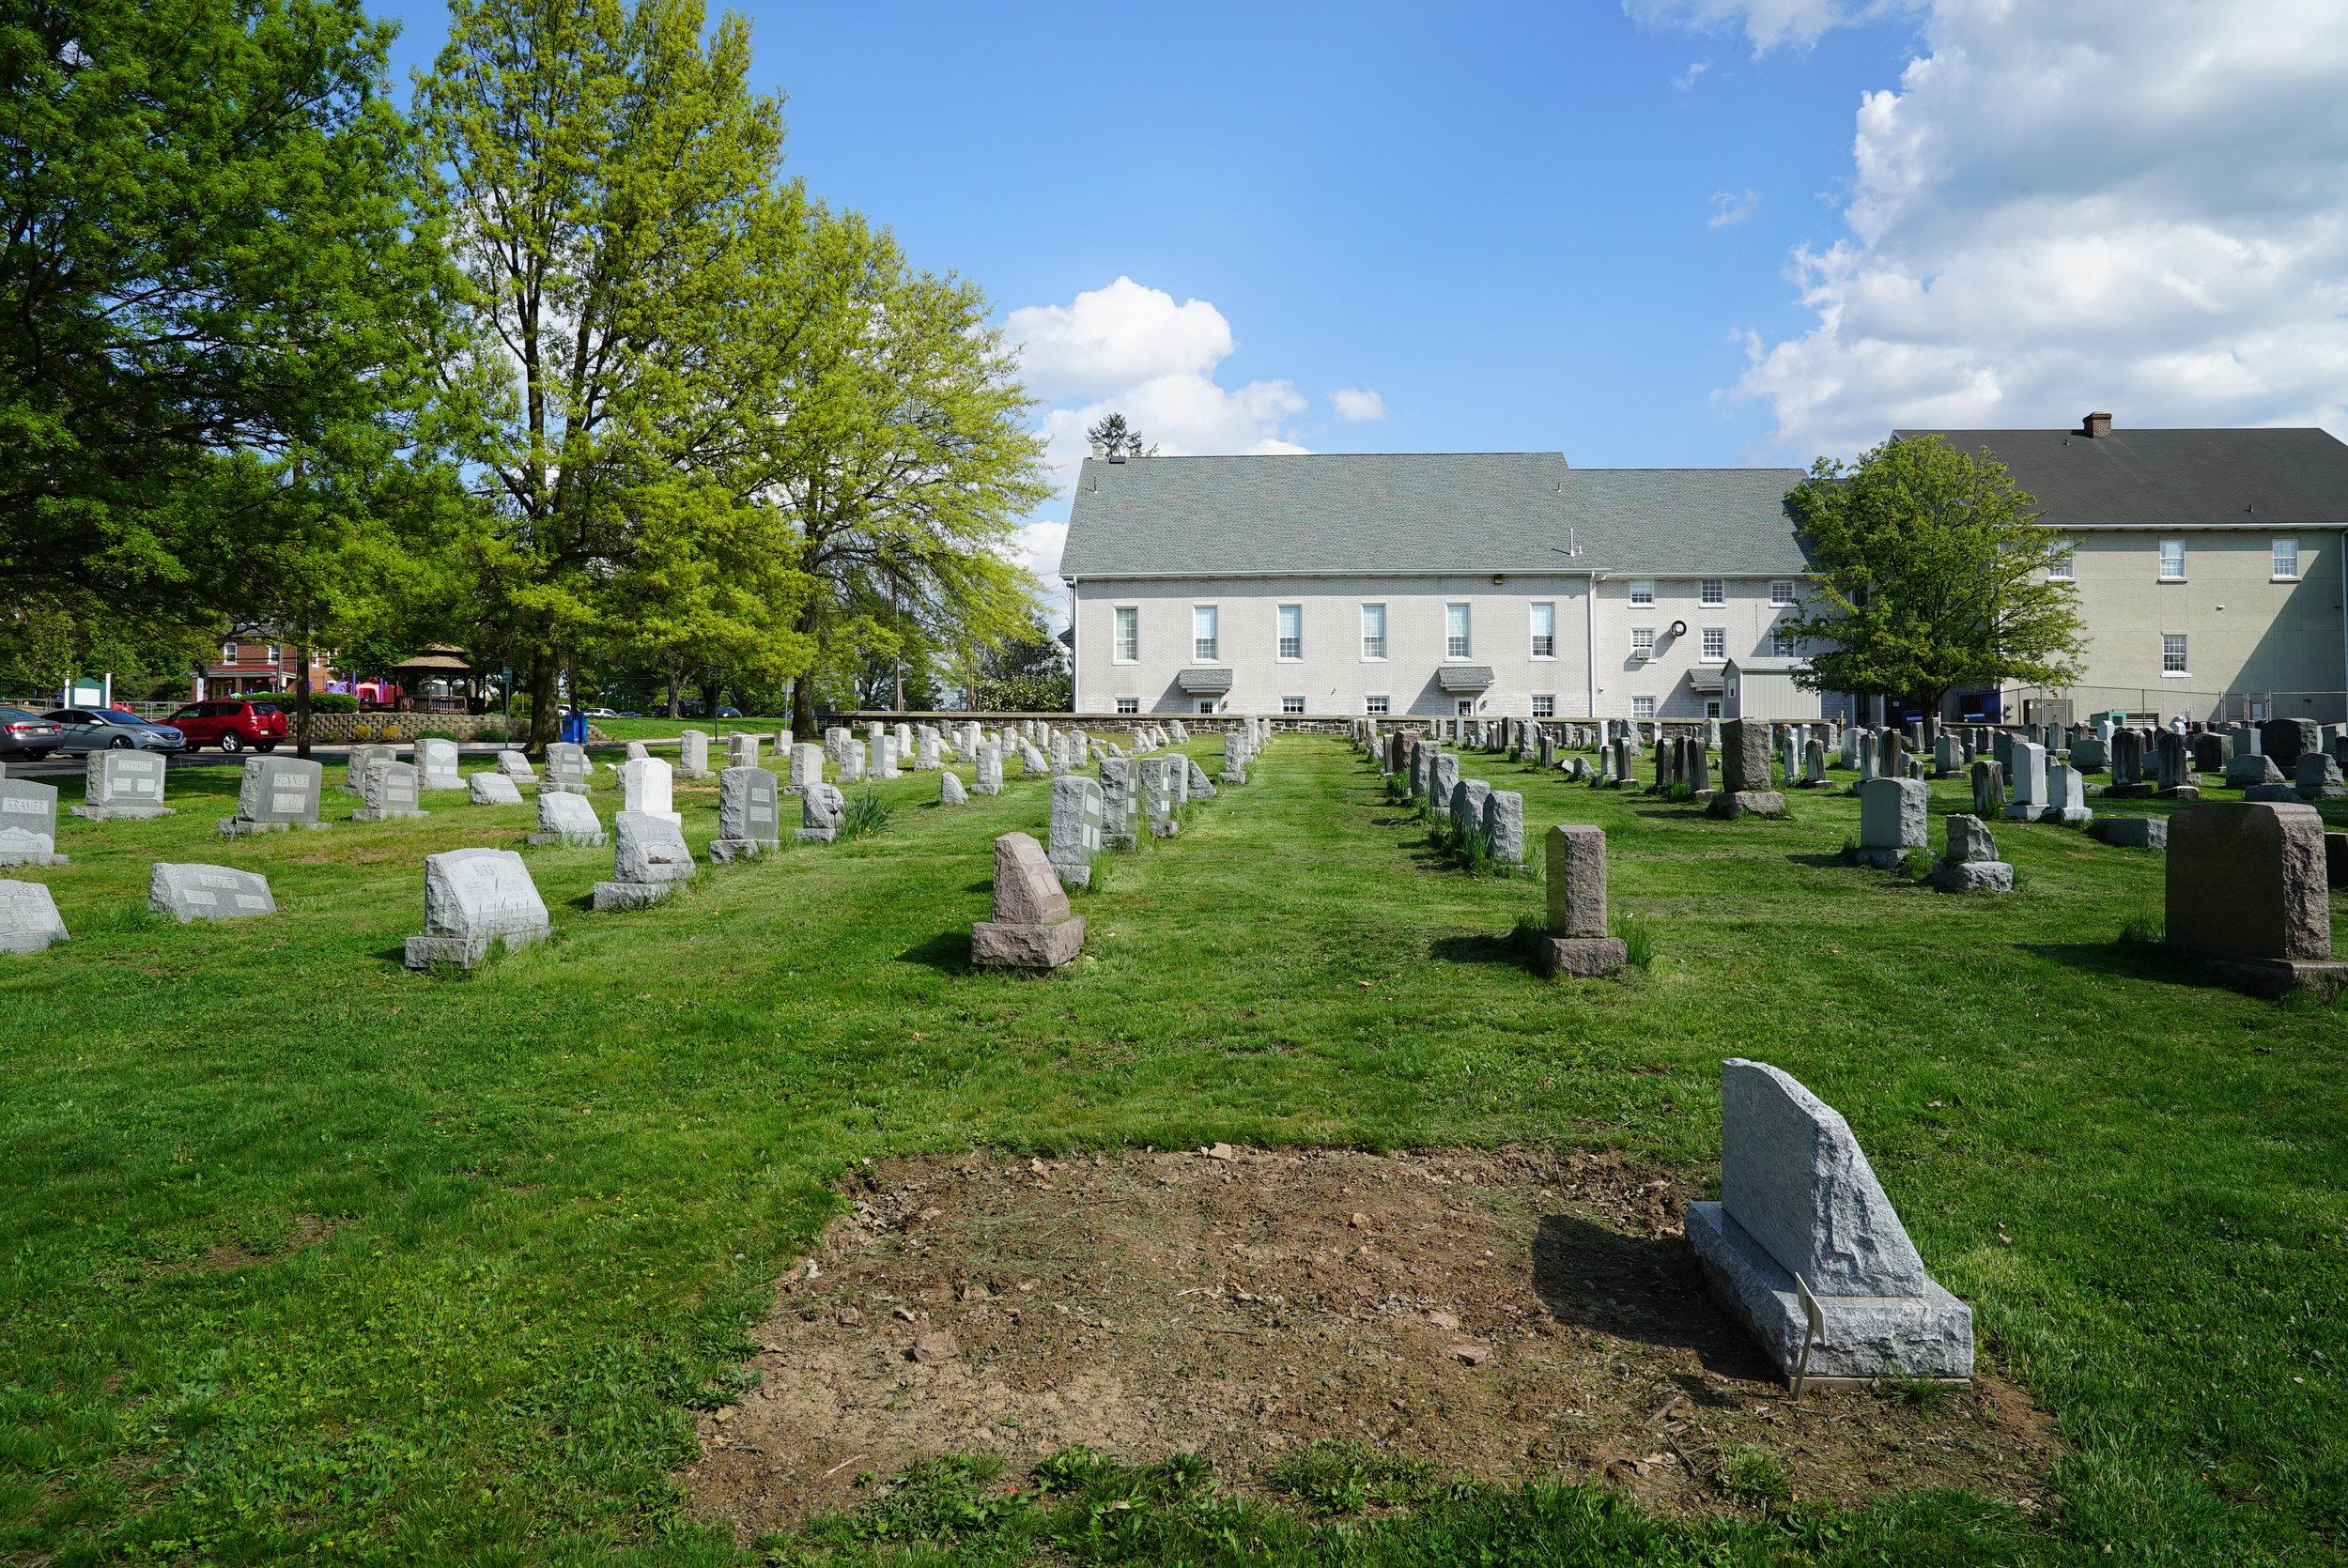 A recent burial. Souderton Mennonite Church Cemetery - Montgomery County, Pennsylvania.